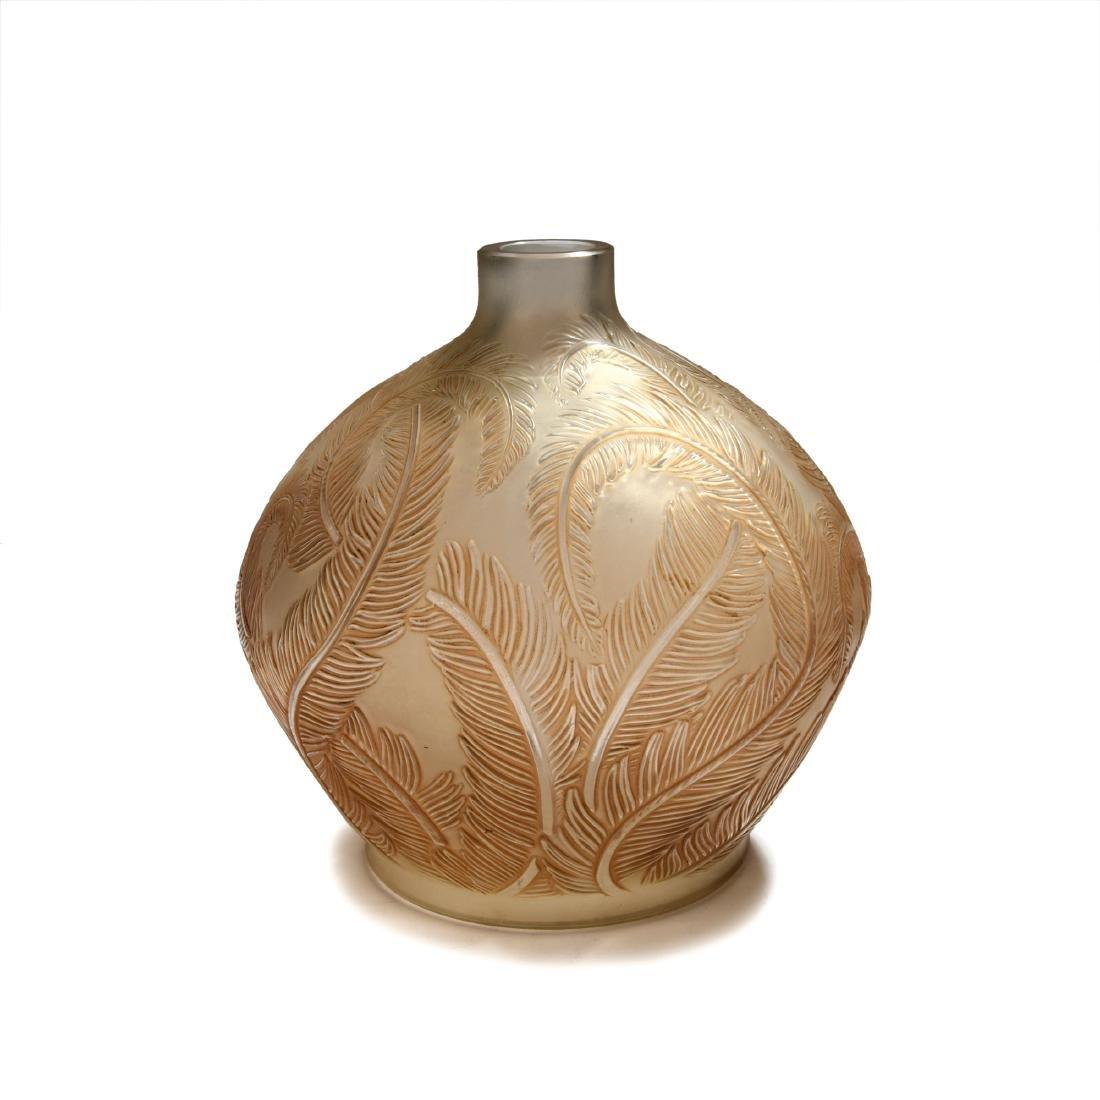 'Plumes' vase, 1920